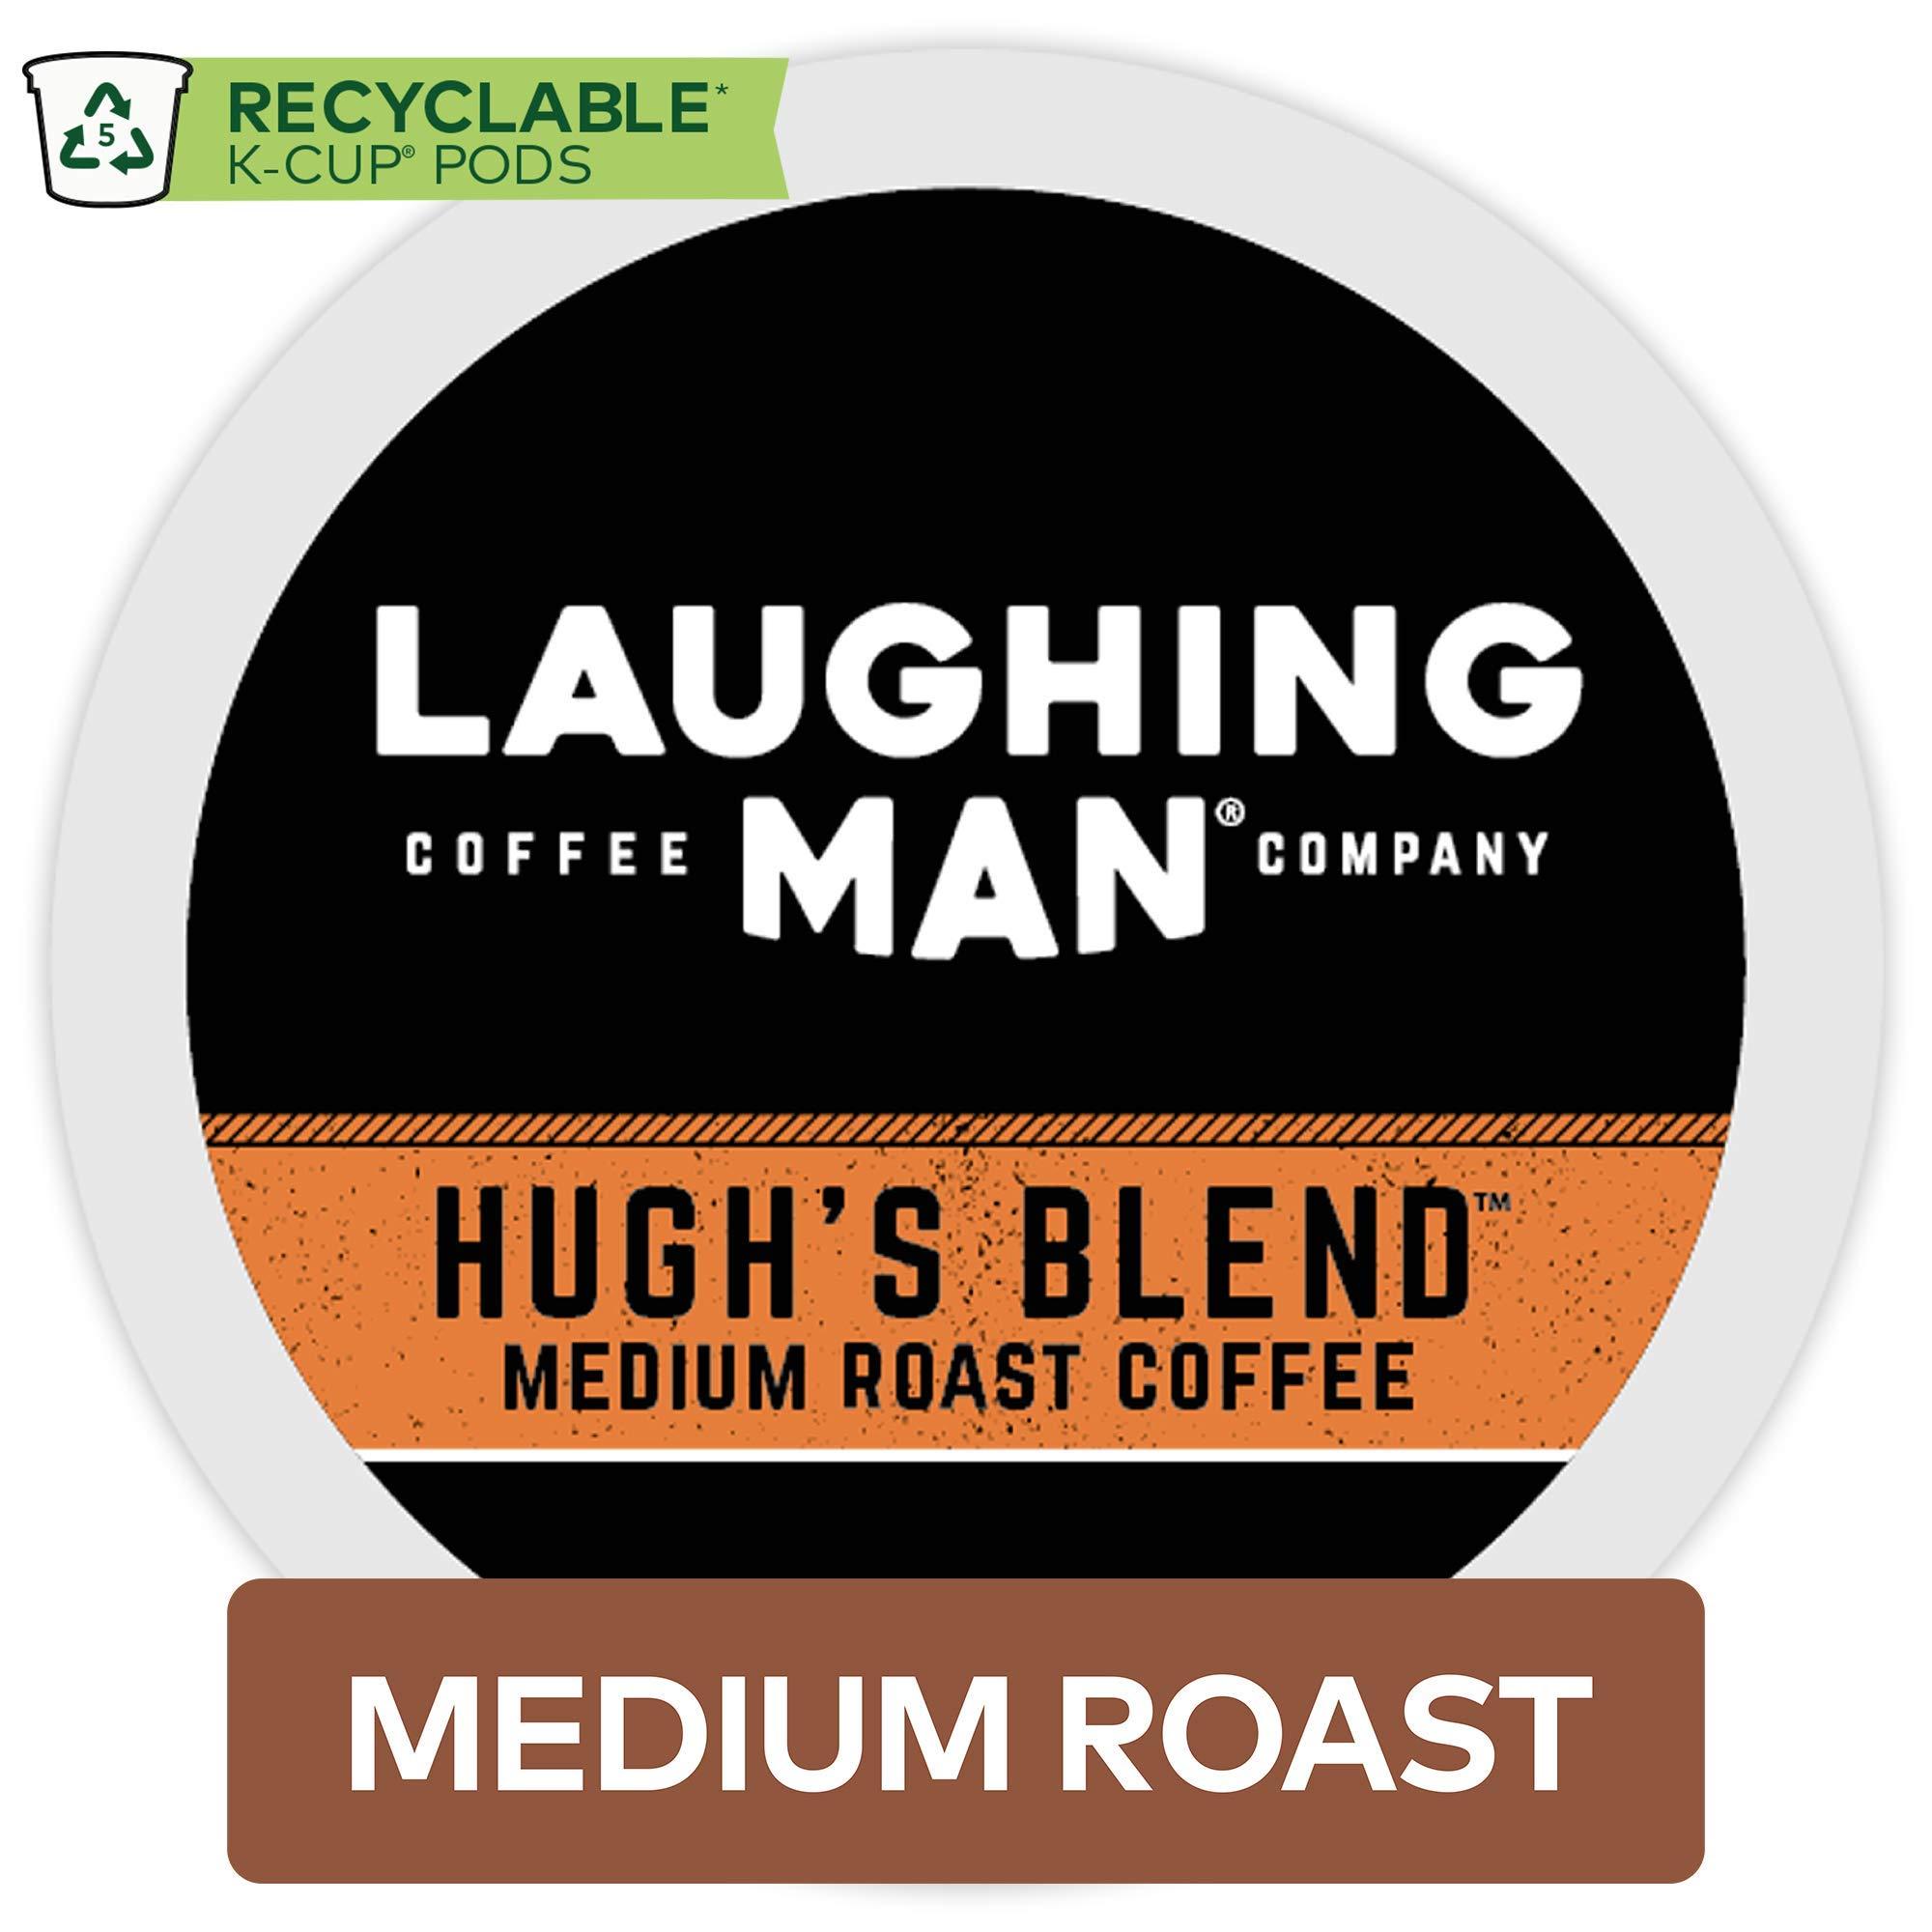 Laughing Man Hugh's Blend, Single Serve Coffee K-Cup Pod, Medium Roast, 60